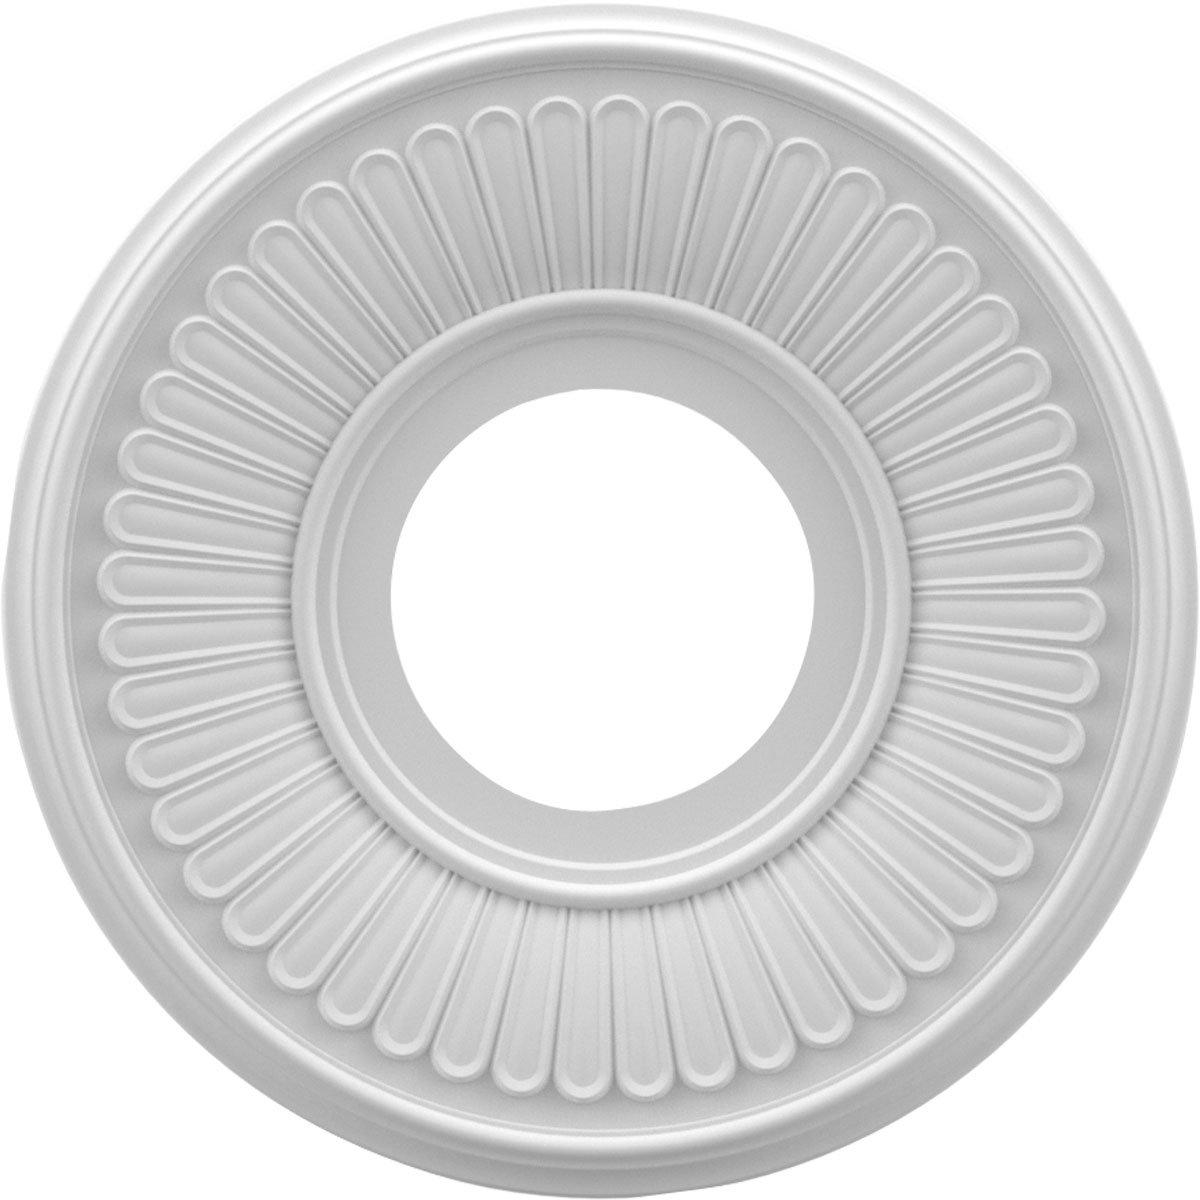 Ekena Millwork CMP10BE Berkshire Medallion Thermoformed Pvc Ceiling, 10'' OD x 3 1/2'' ID x 3/4'' P, White